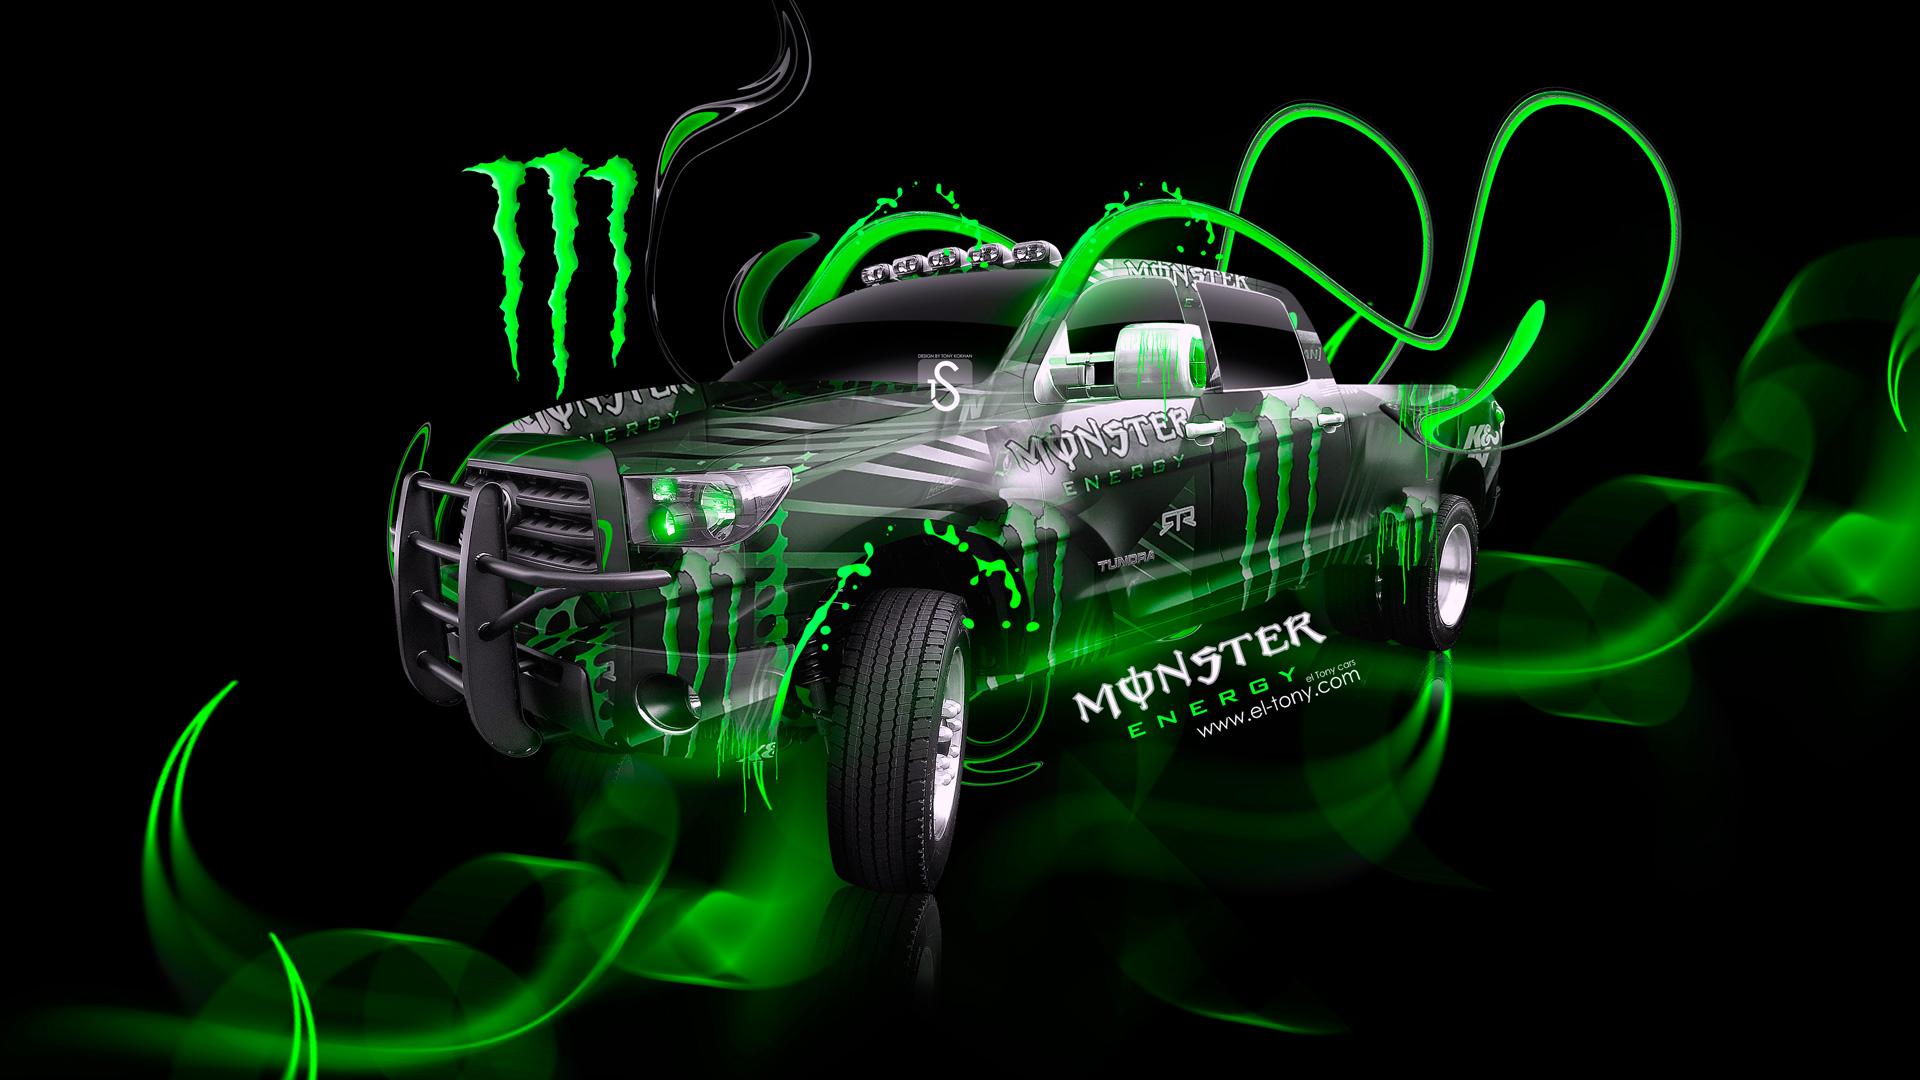 monster energy toyota chaser jzx100 jdm front plastic car 2015 monster 1920x1080